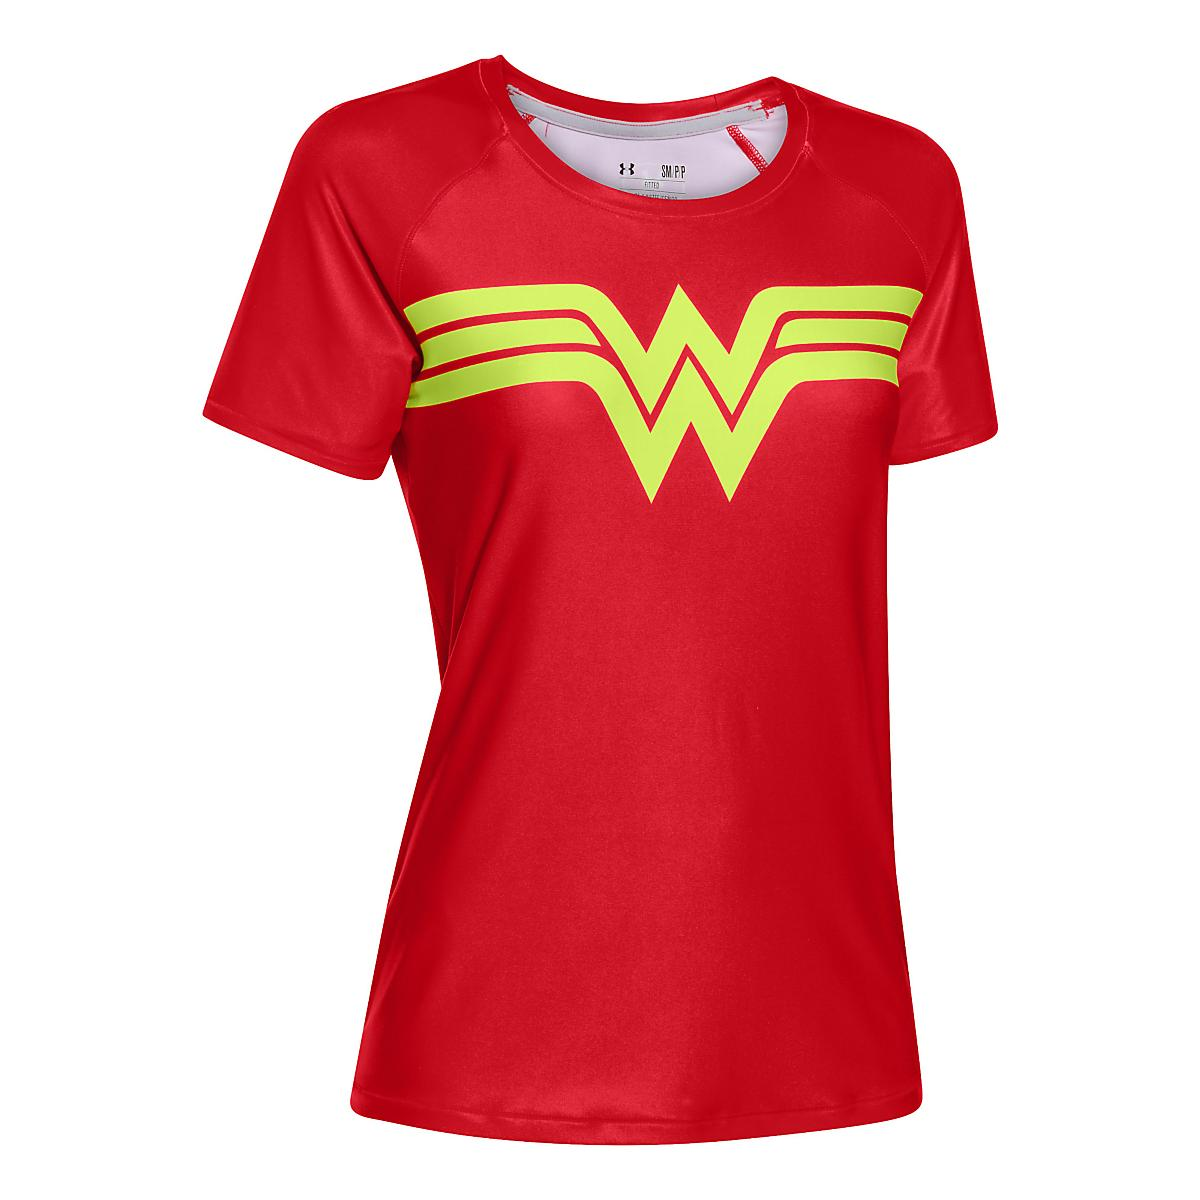 6ddc413df9b66 Womens Under Armour Alter Ego Heatgear Sonic Wonder Woman T Short Sleeve  Technical Tops at Road Runner Sports